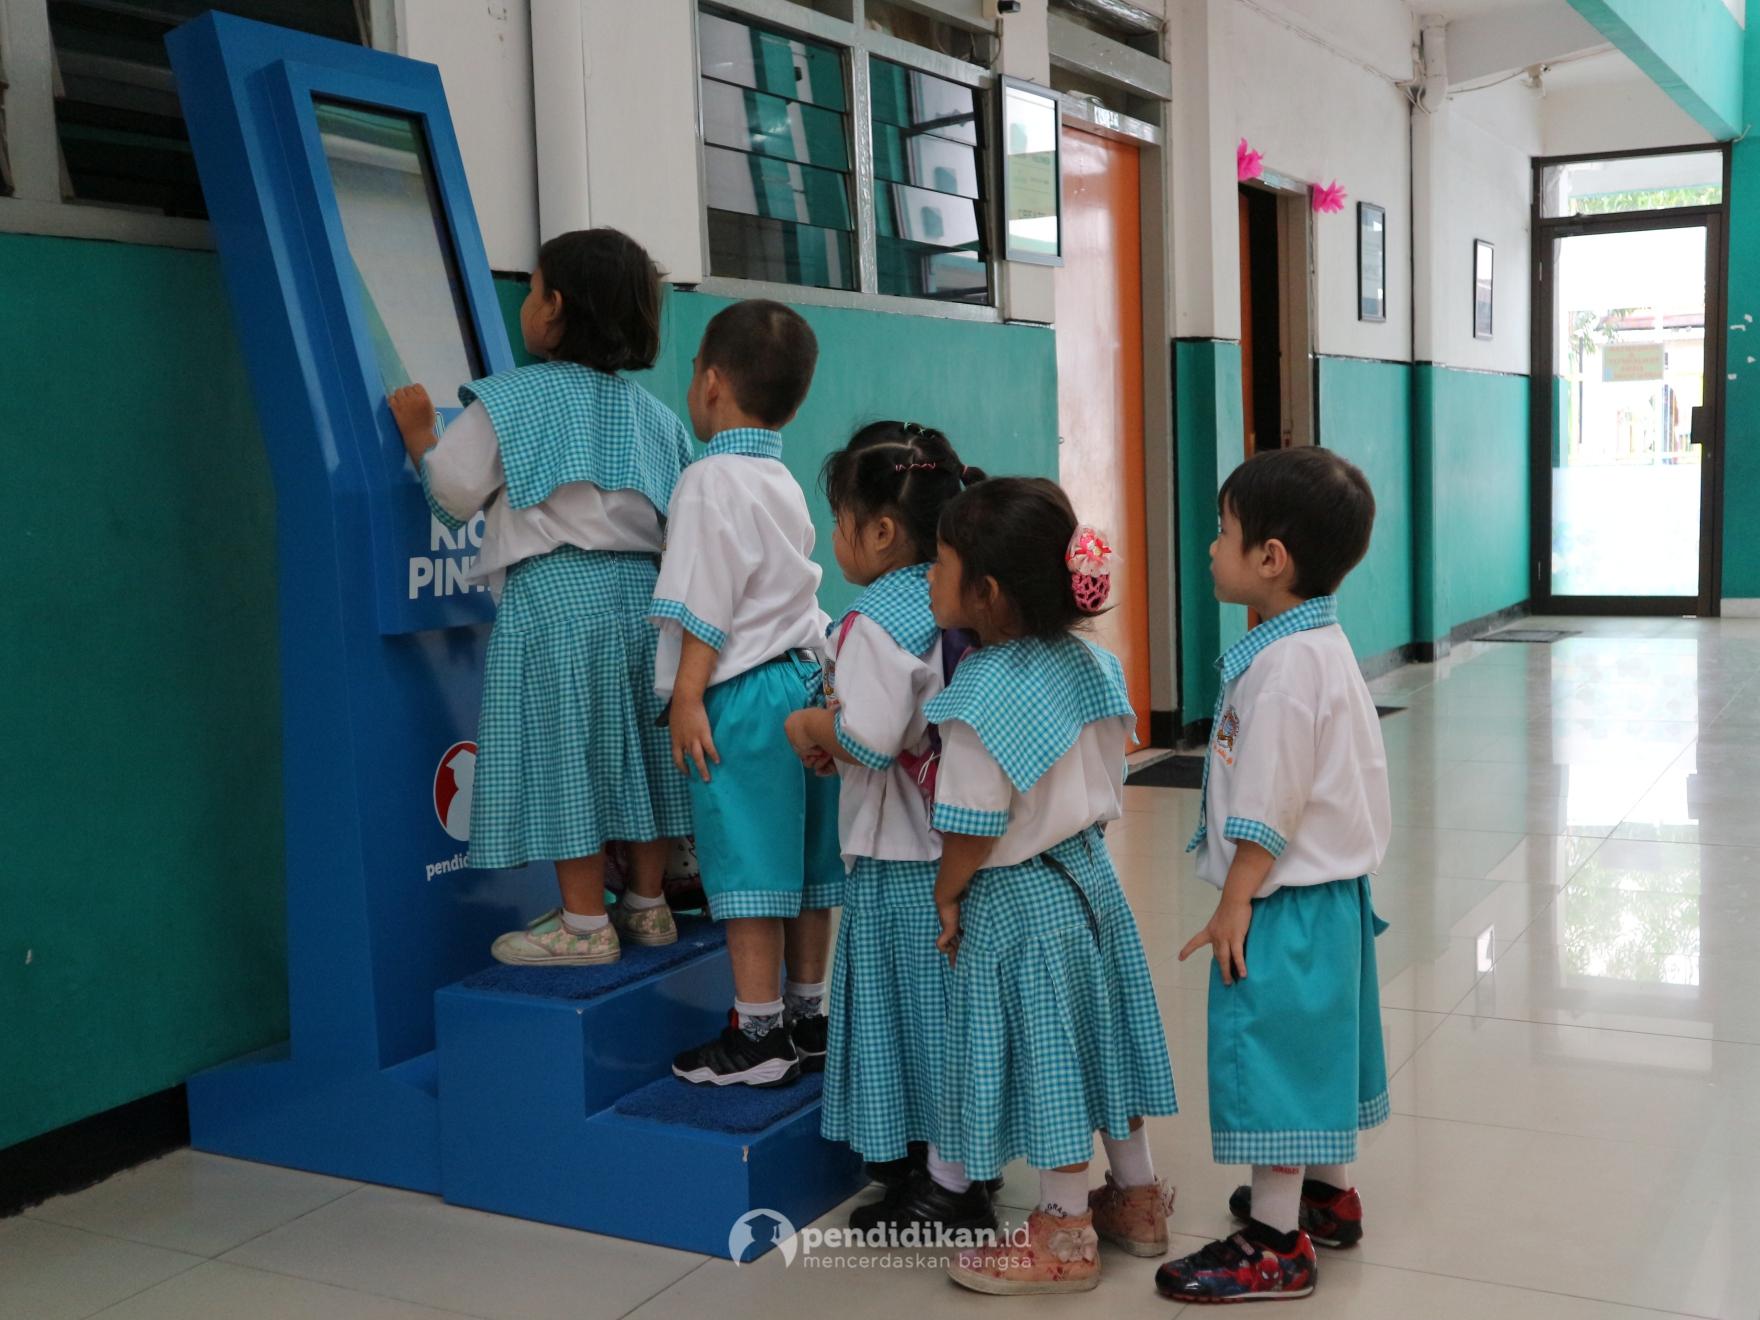 Siswa Sekolah Dasar dan Pra-Sekolah Beramai-Ramai Antre Kipin ATM pada Open House TK-SD Gracia Surabaya